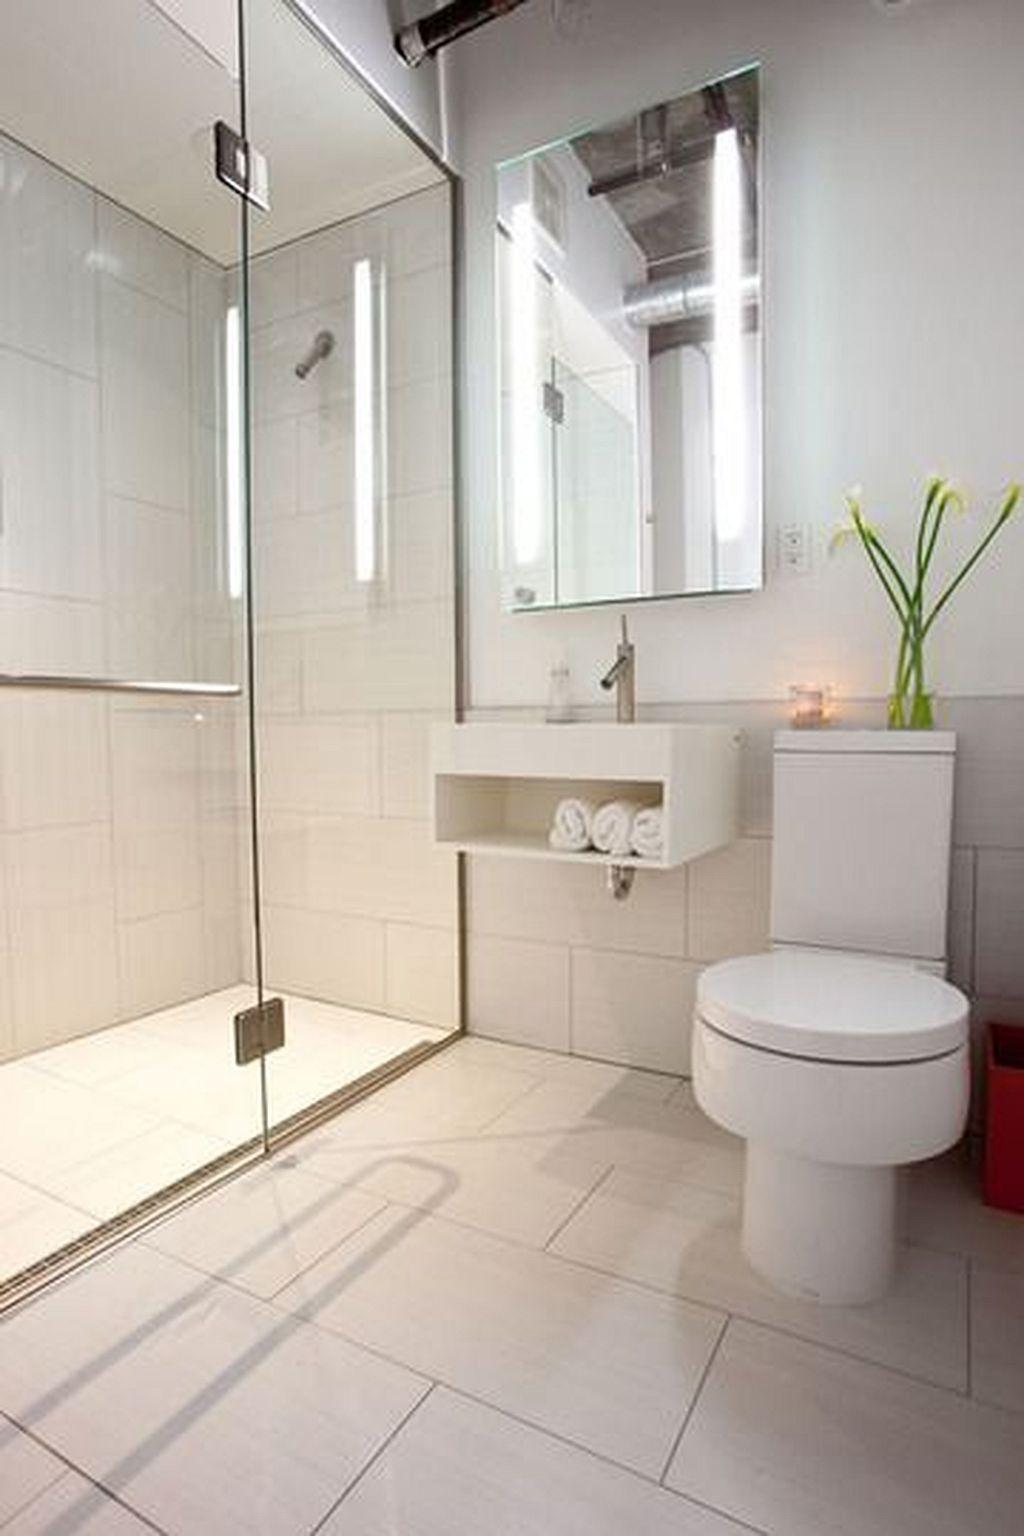 30 incredible modern bathroom shower ideas for small on bathroom renovation ideas white id=58006